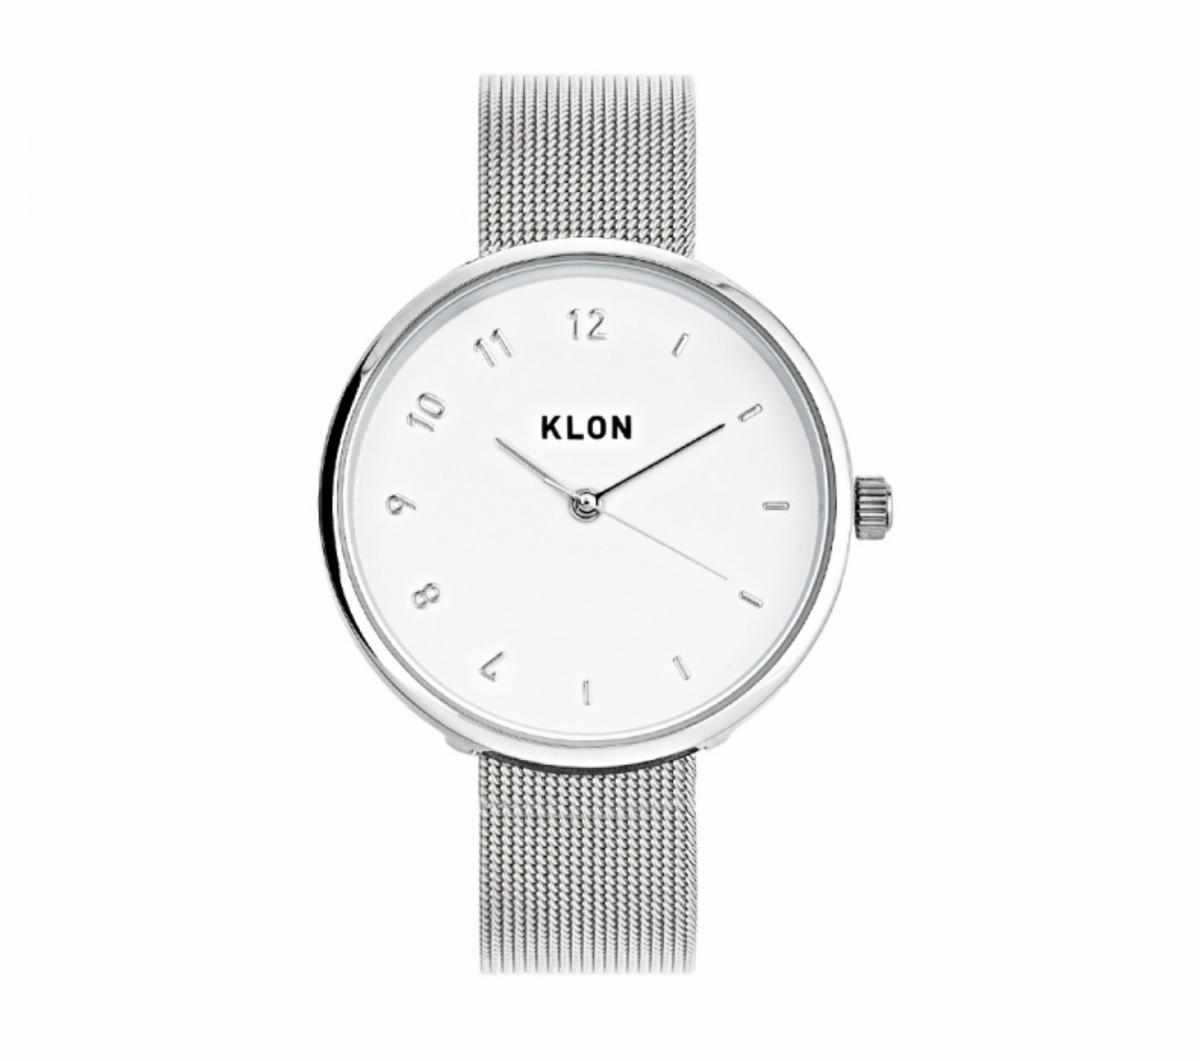 klonの商品紹介画像2枚目